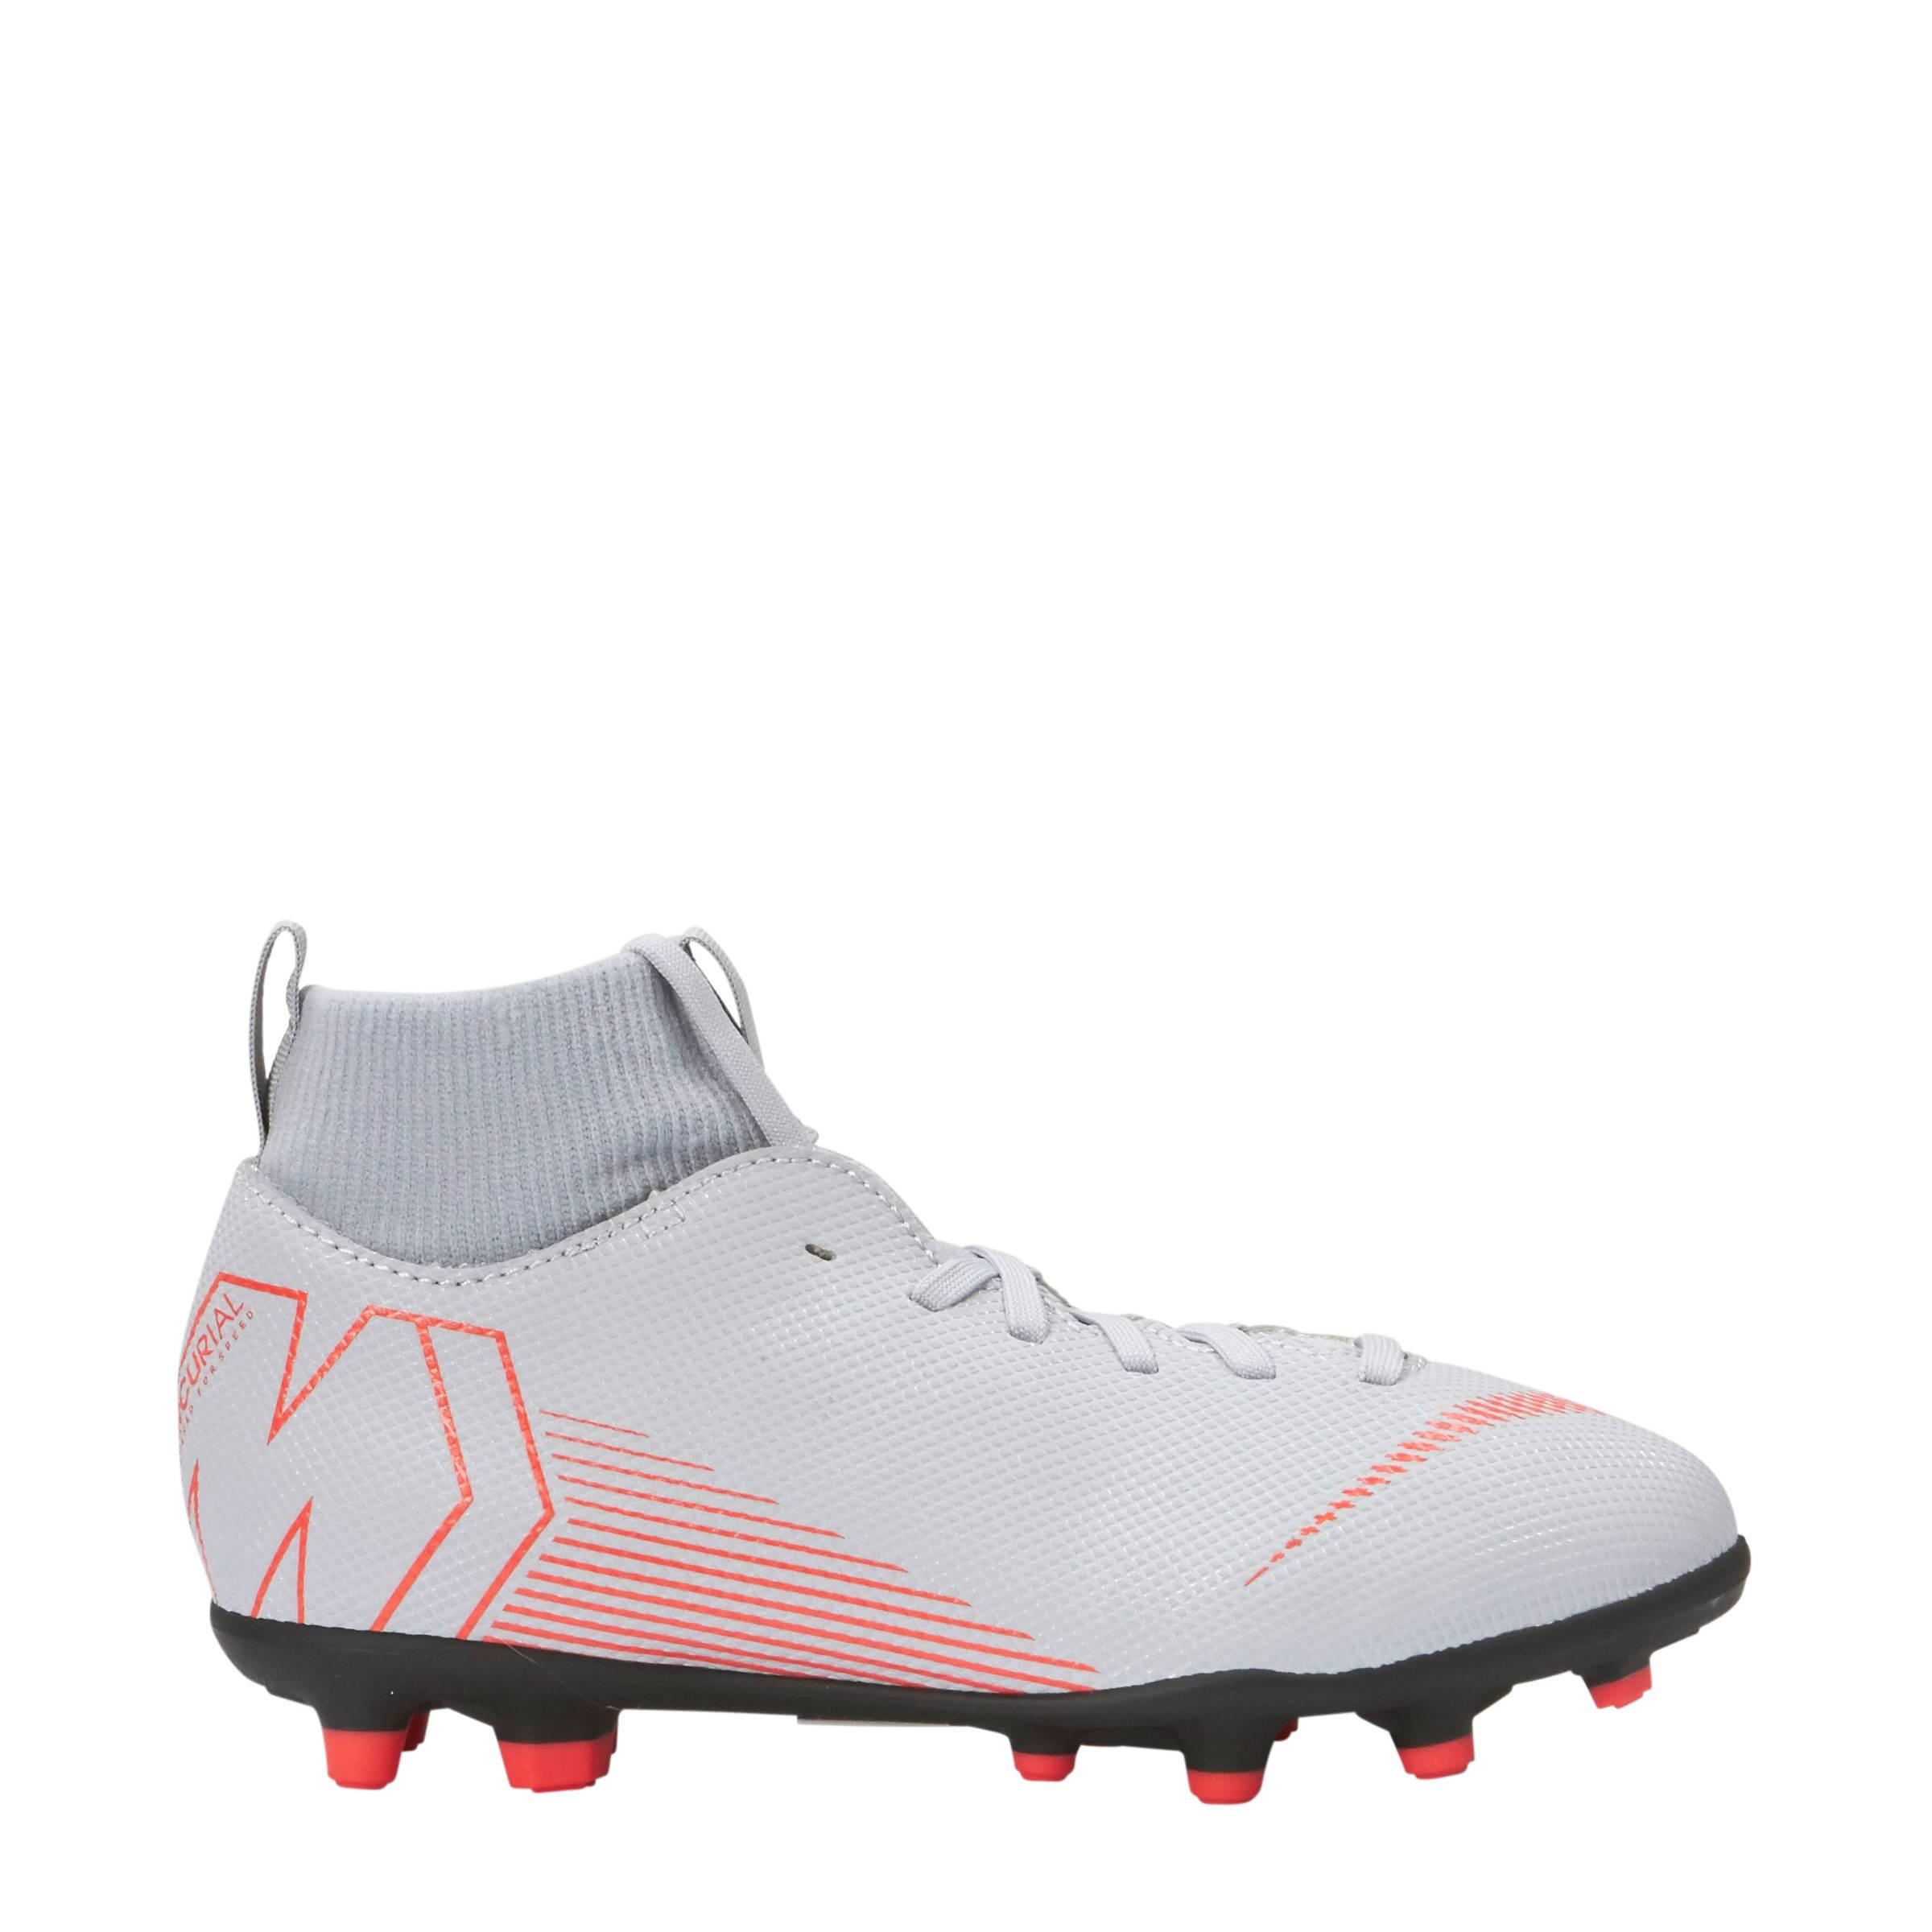 low priced 772b9 4d9df Nike JR Superfly 6 Club FGMG voetbalschoenen grijs  wehkamp